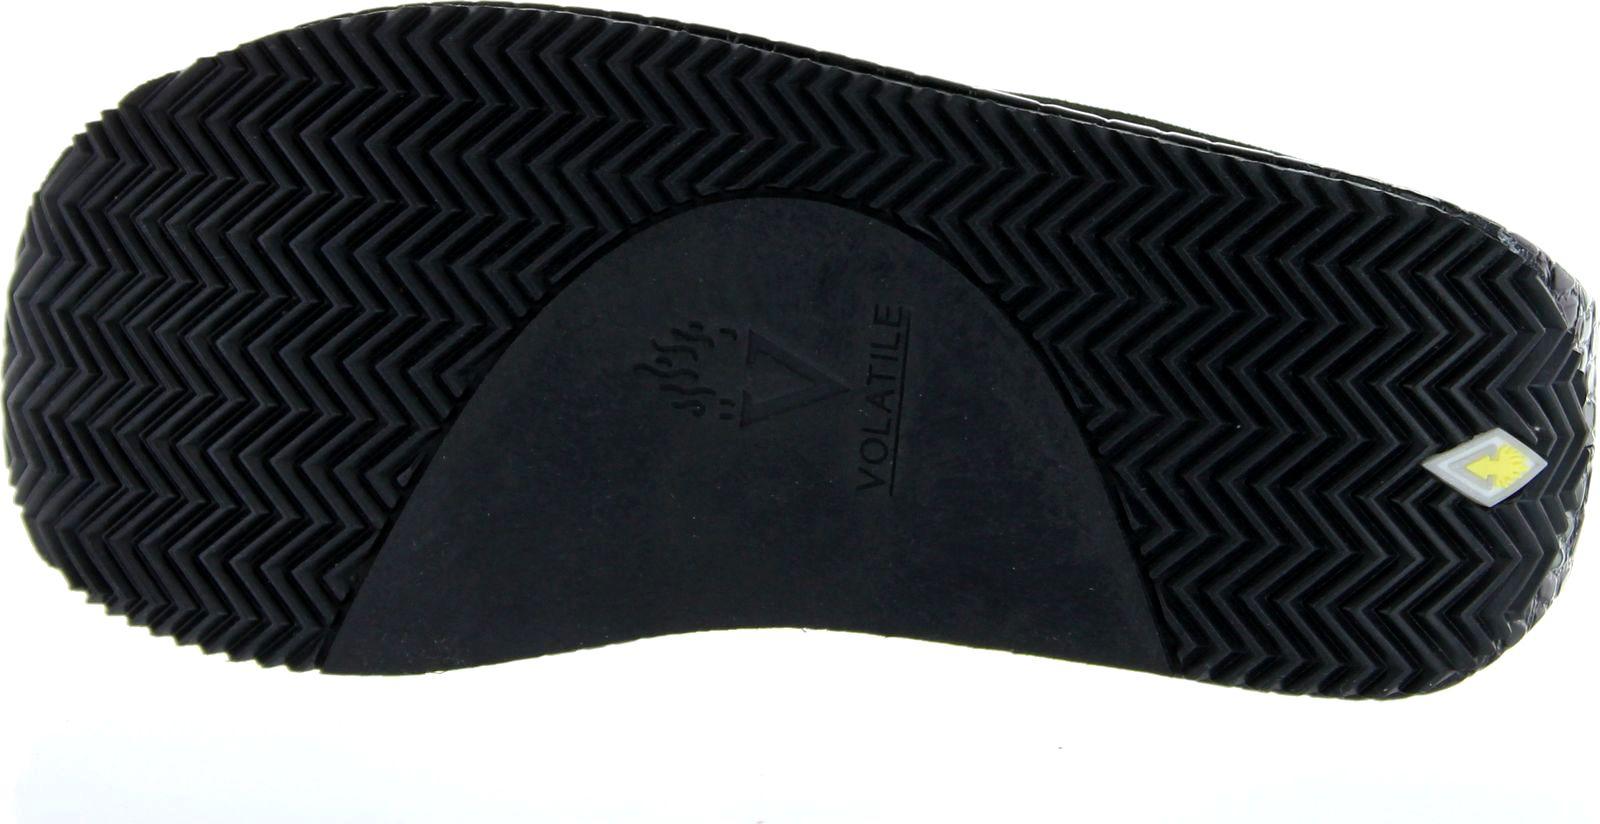 Volatile Womens Mini Croco Wedge Sandals